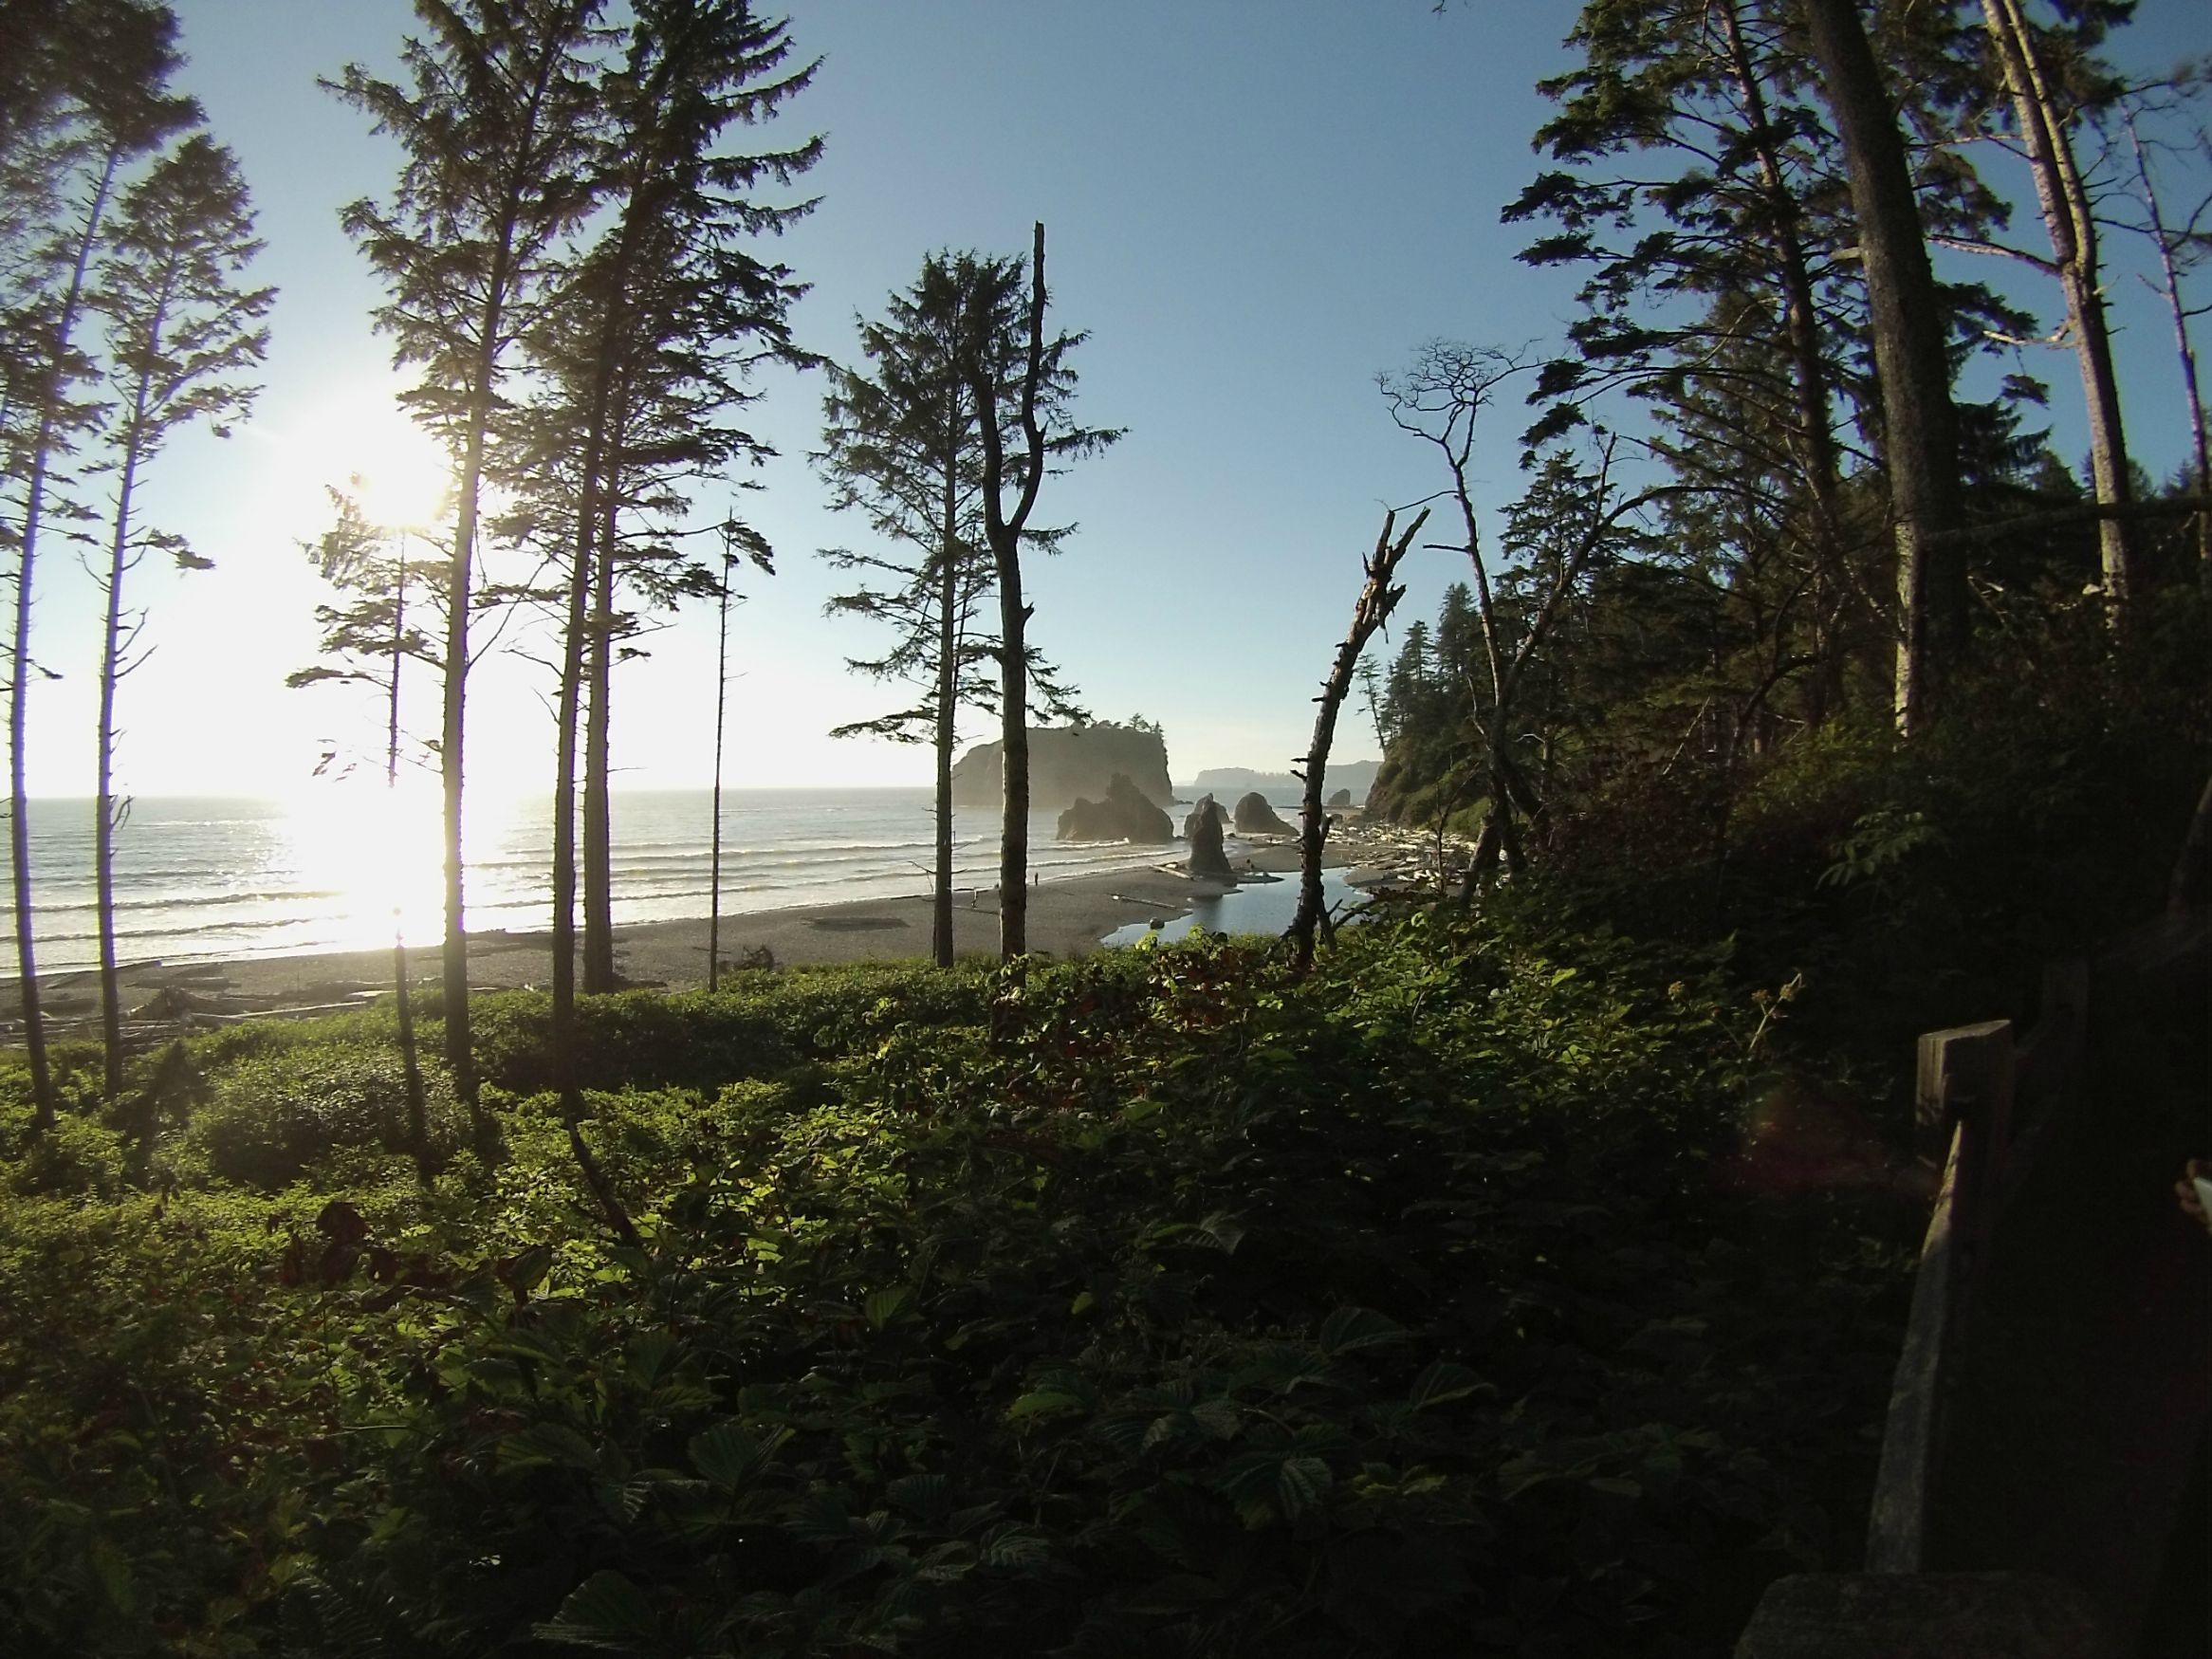 Ruby Beach Olympic National Park Washington [OC][2592x1944]